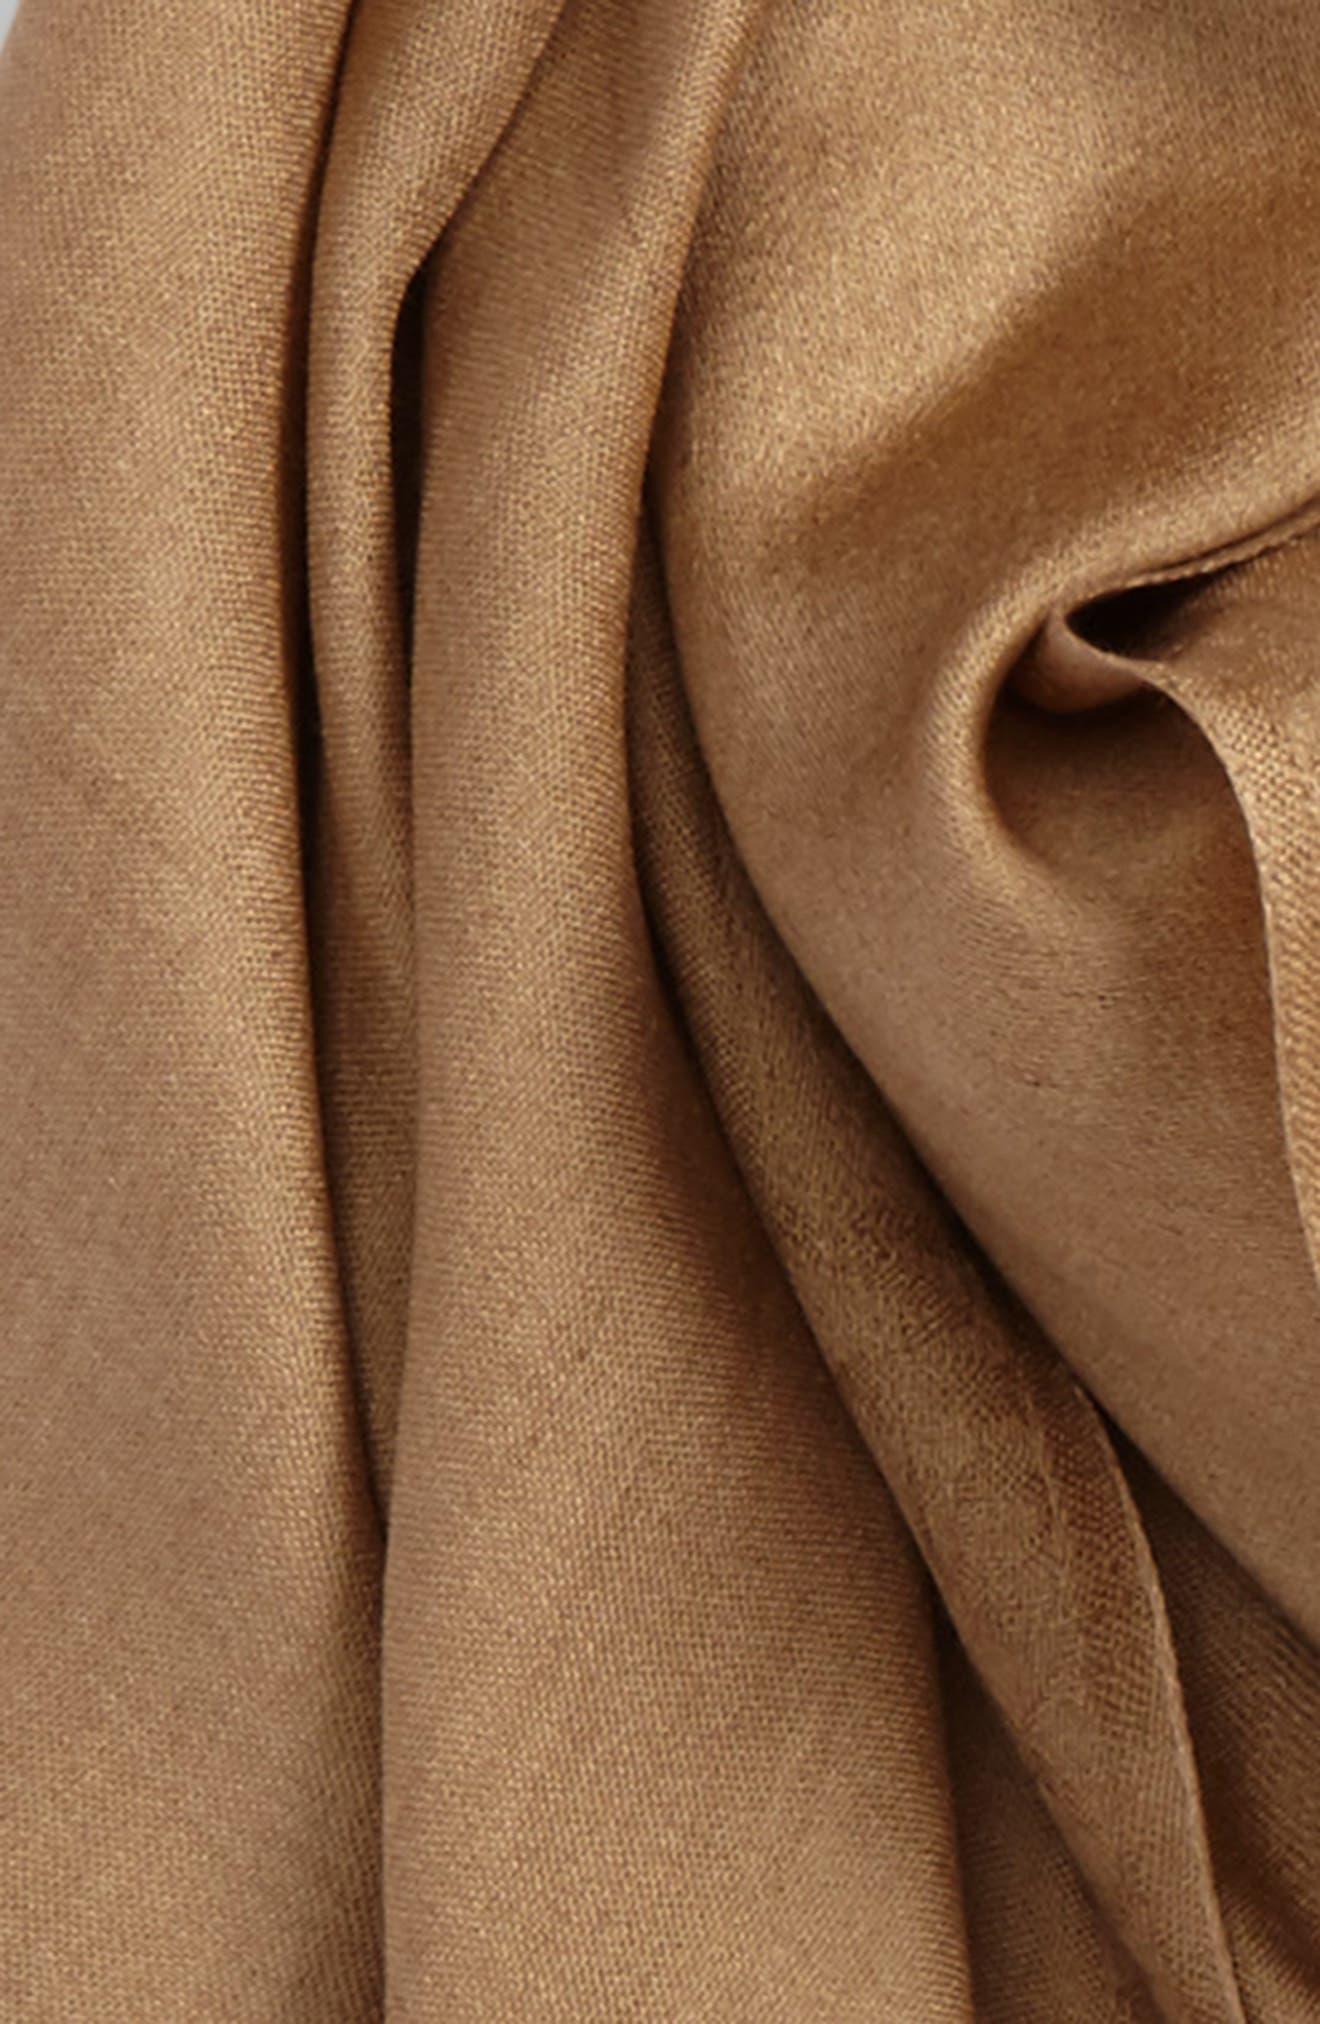 Upupa Silk Scarf,                             Alternate thumbnail 3, color,                             232